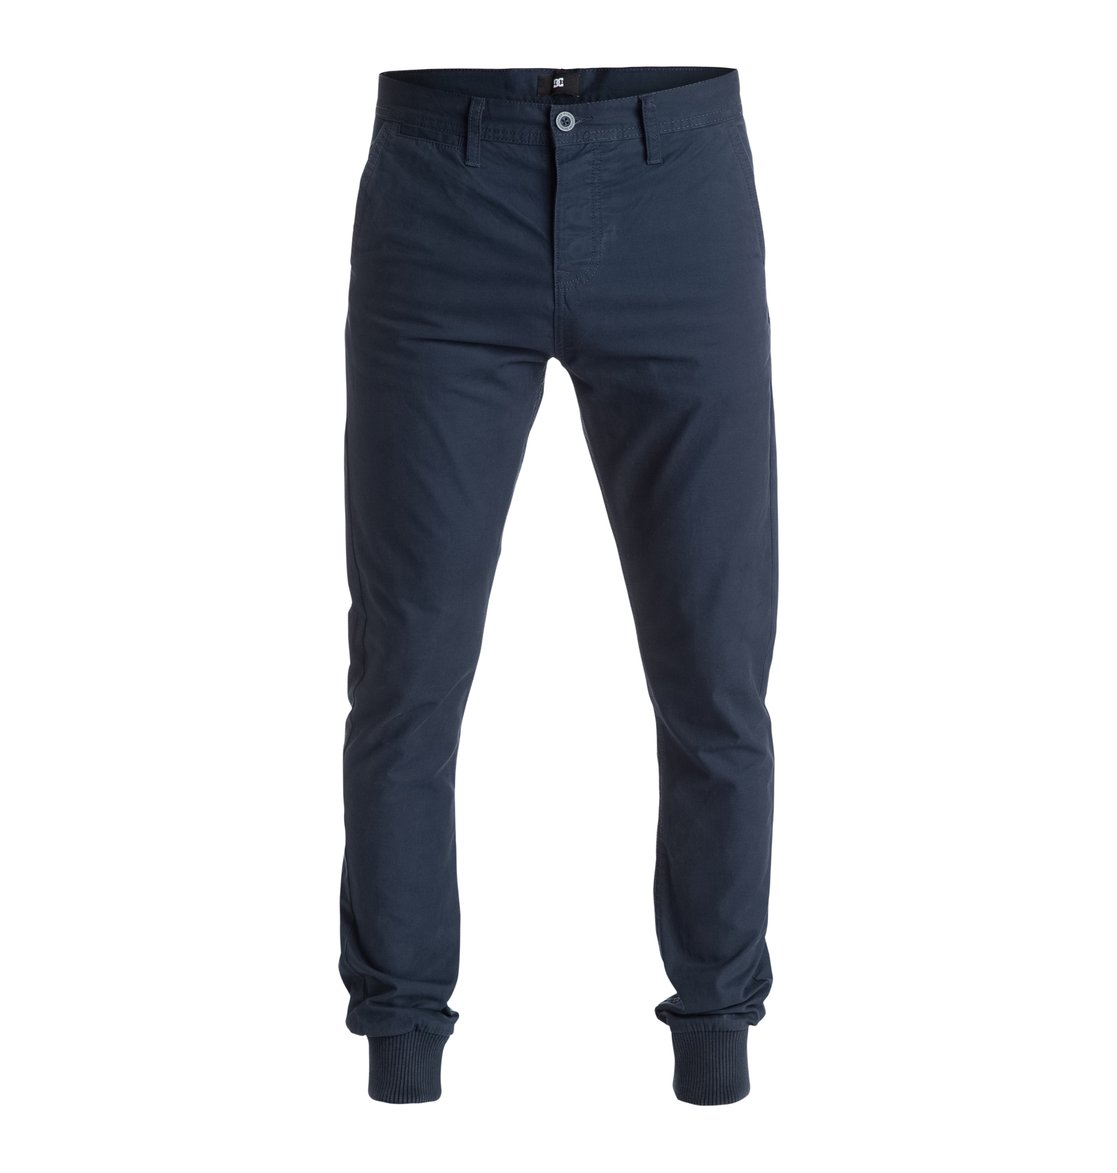 westgarth pantalon de jogging edynp03084 dc shoes. Black Bedroom Furniture Sets. Home Design Ideas